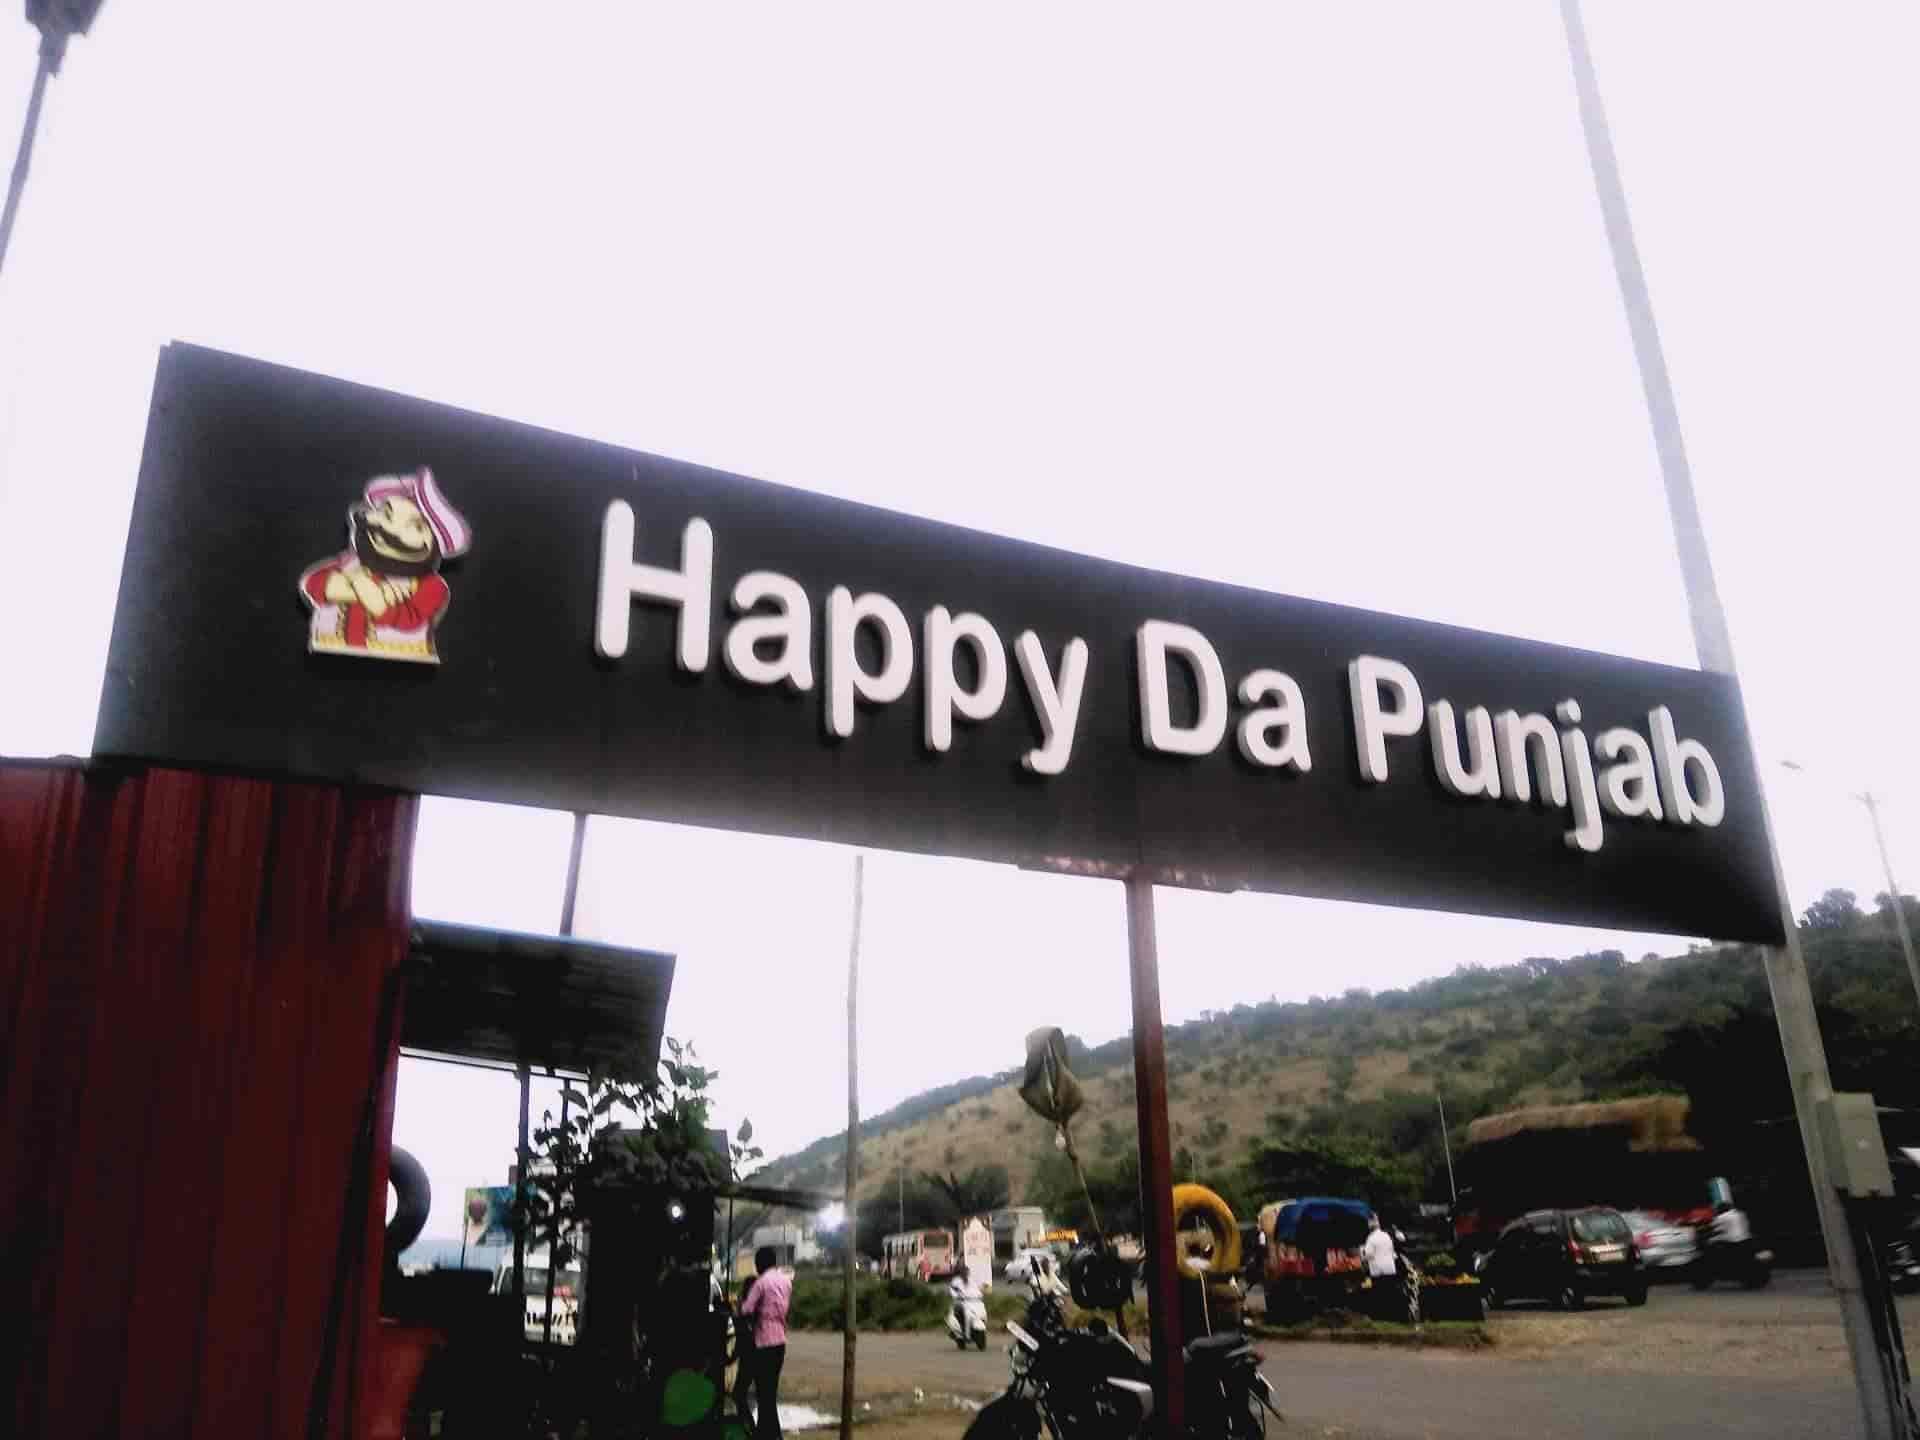 Happy Da Punjab